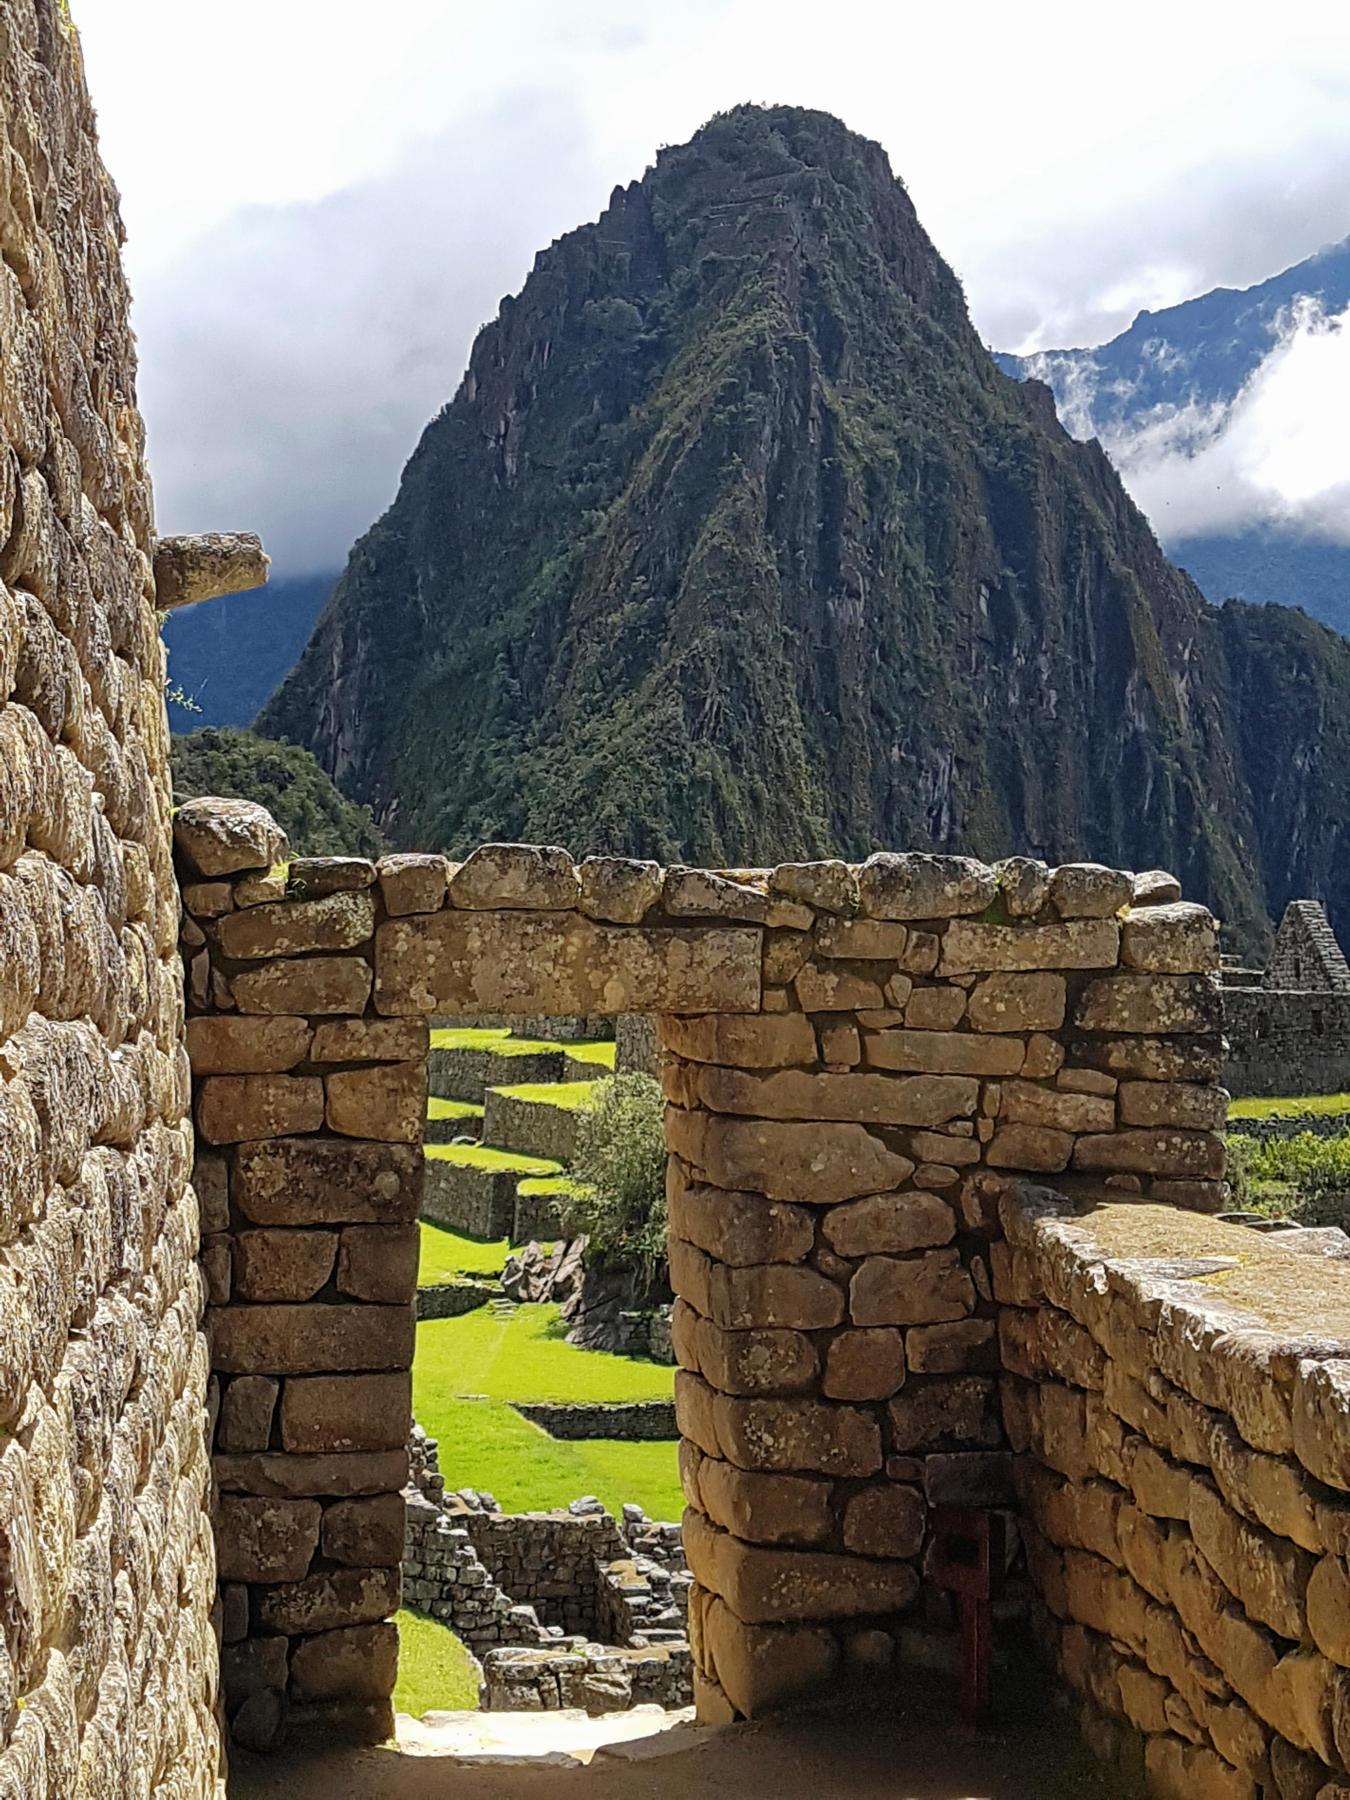 Inca archway at Machu Picchu